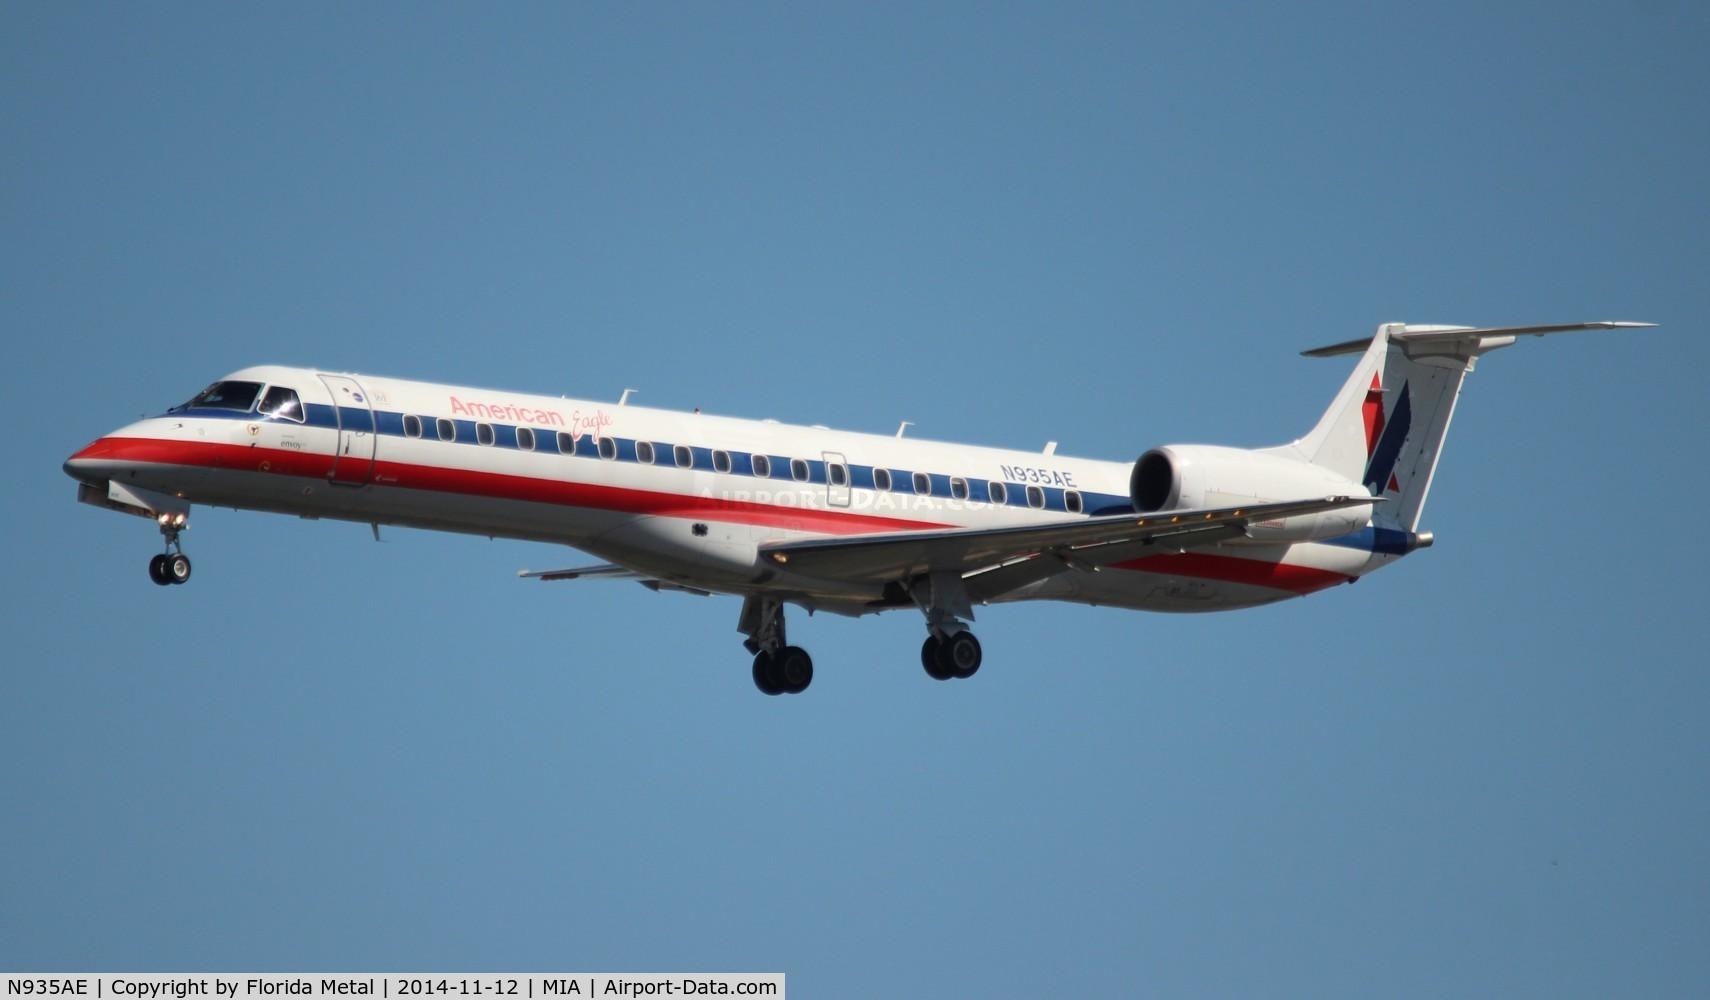 N935AE, 2005 Embraer ERJ-145LR (EMB-145LR) C/N 14500920, American Eagle